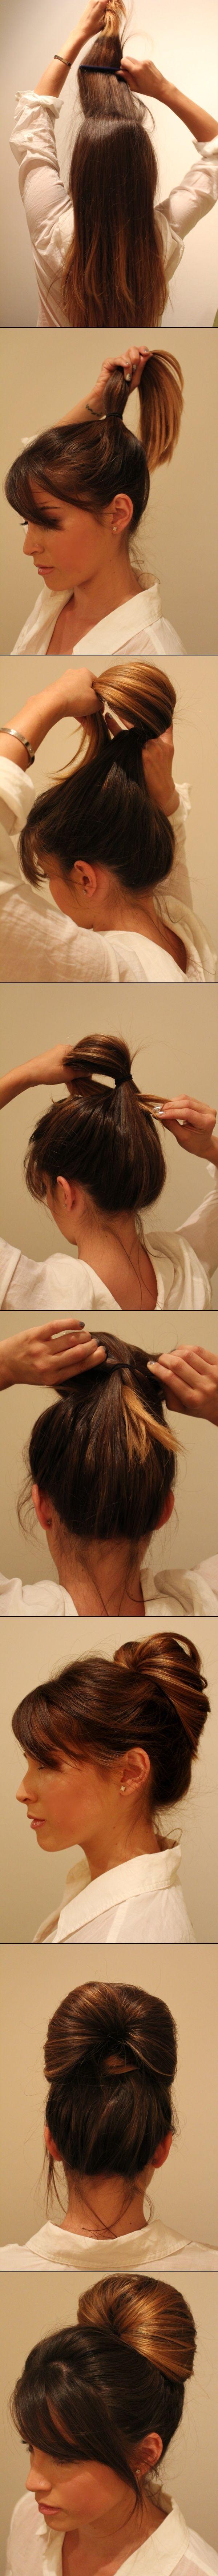 58 best Hair Inspiration images on Pinterest